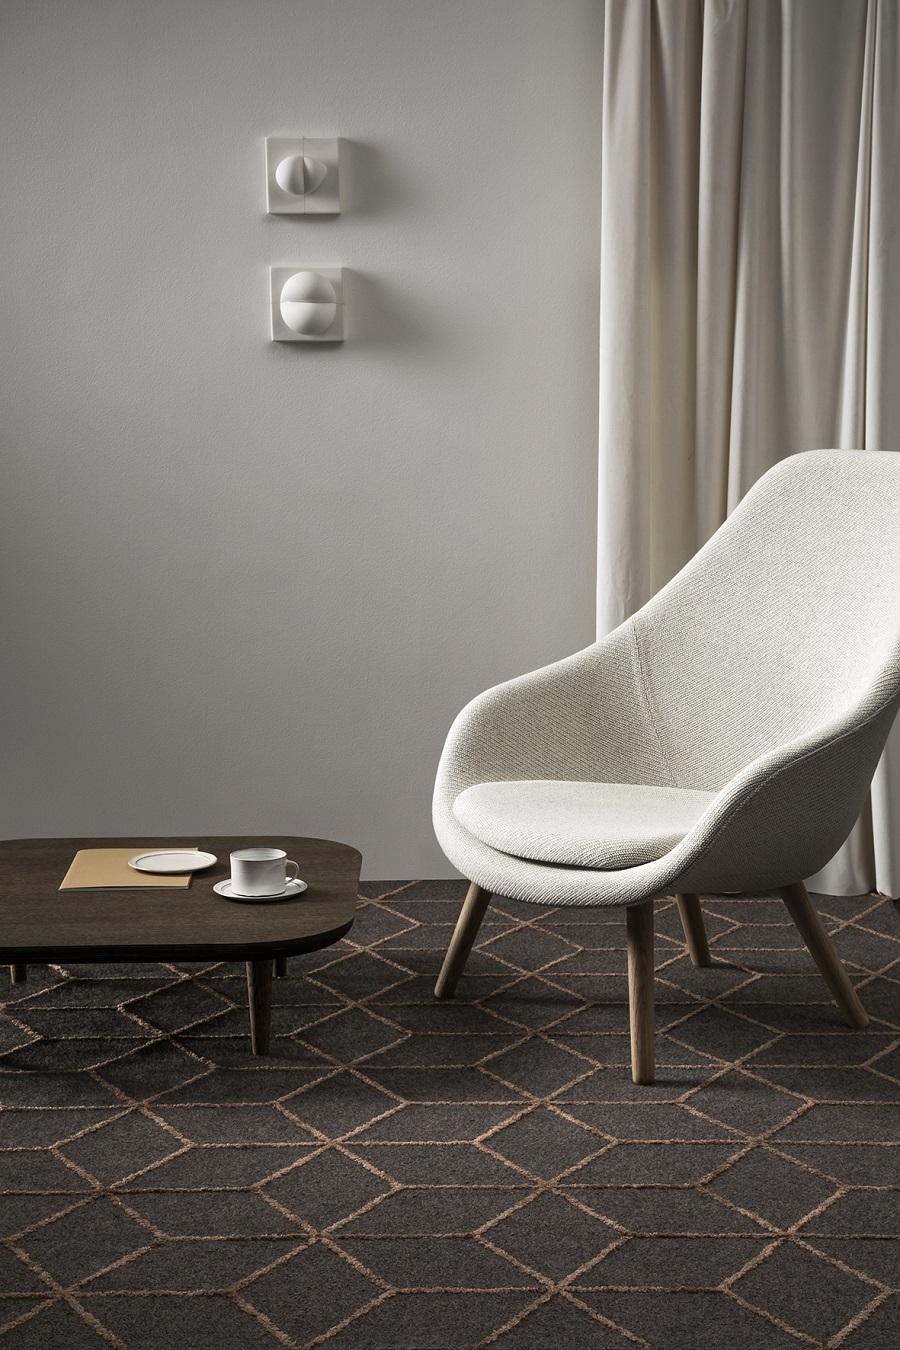 Handtuftad matta Vega Aster Design under fåtölj, från Ogeborg Design Collection.